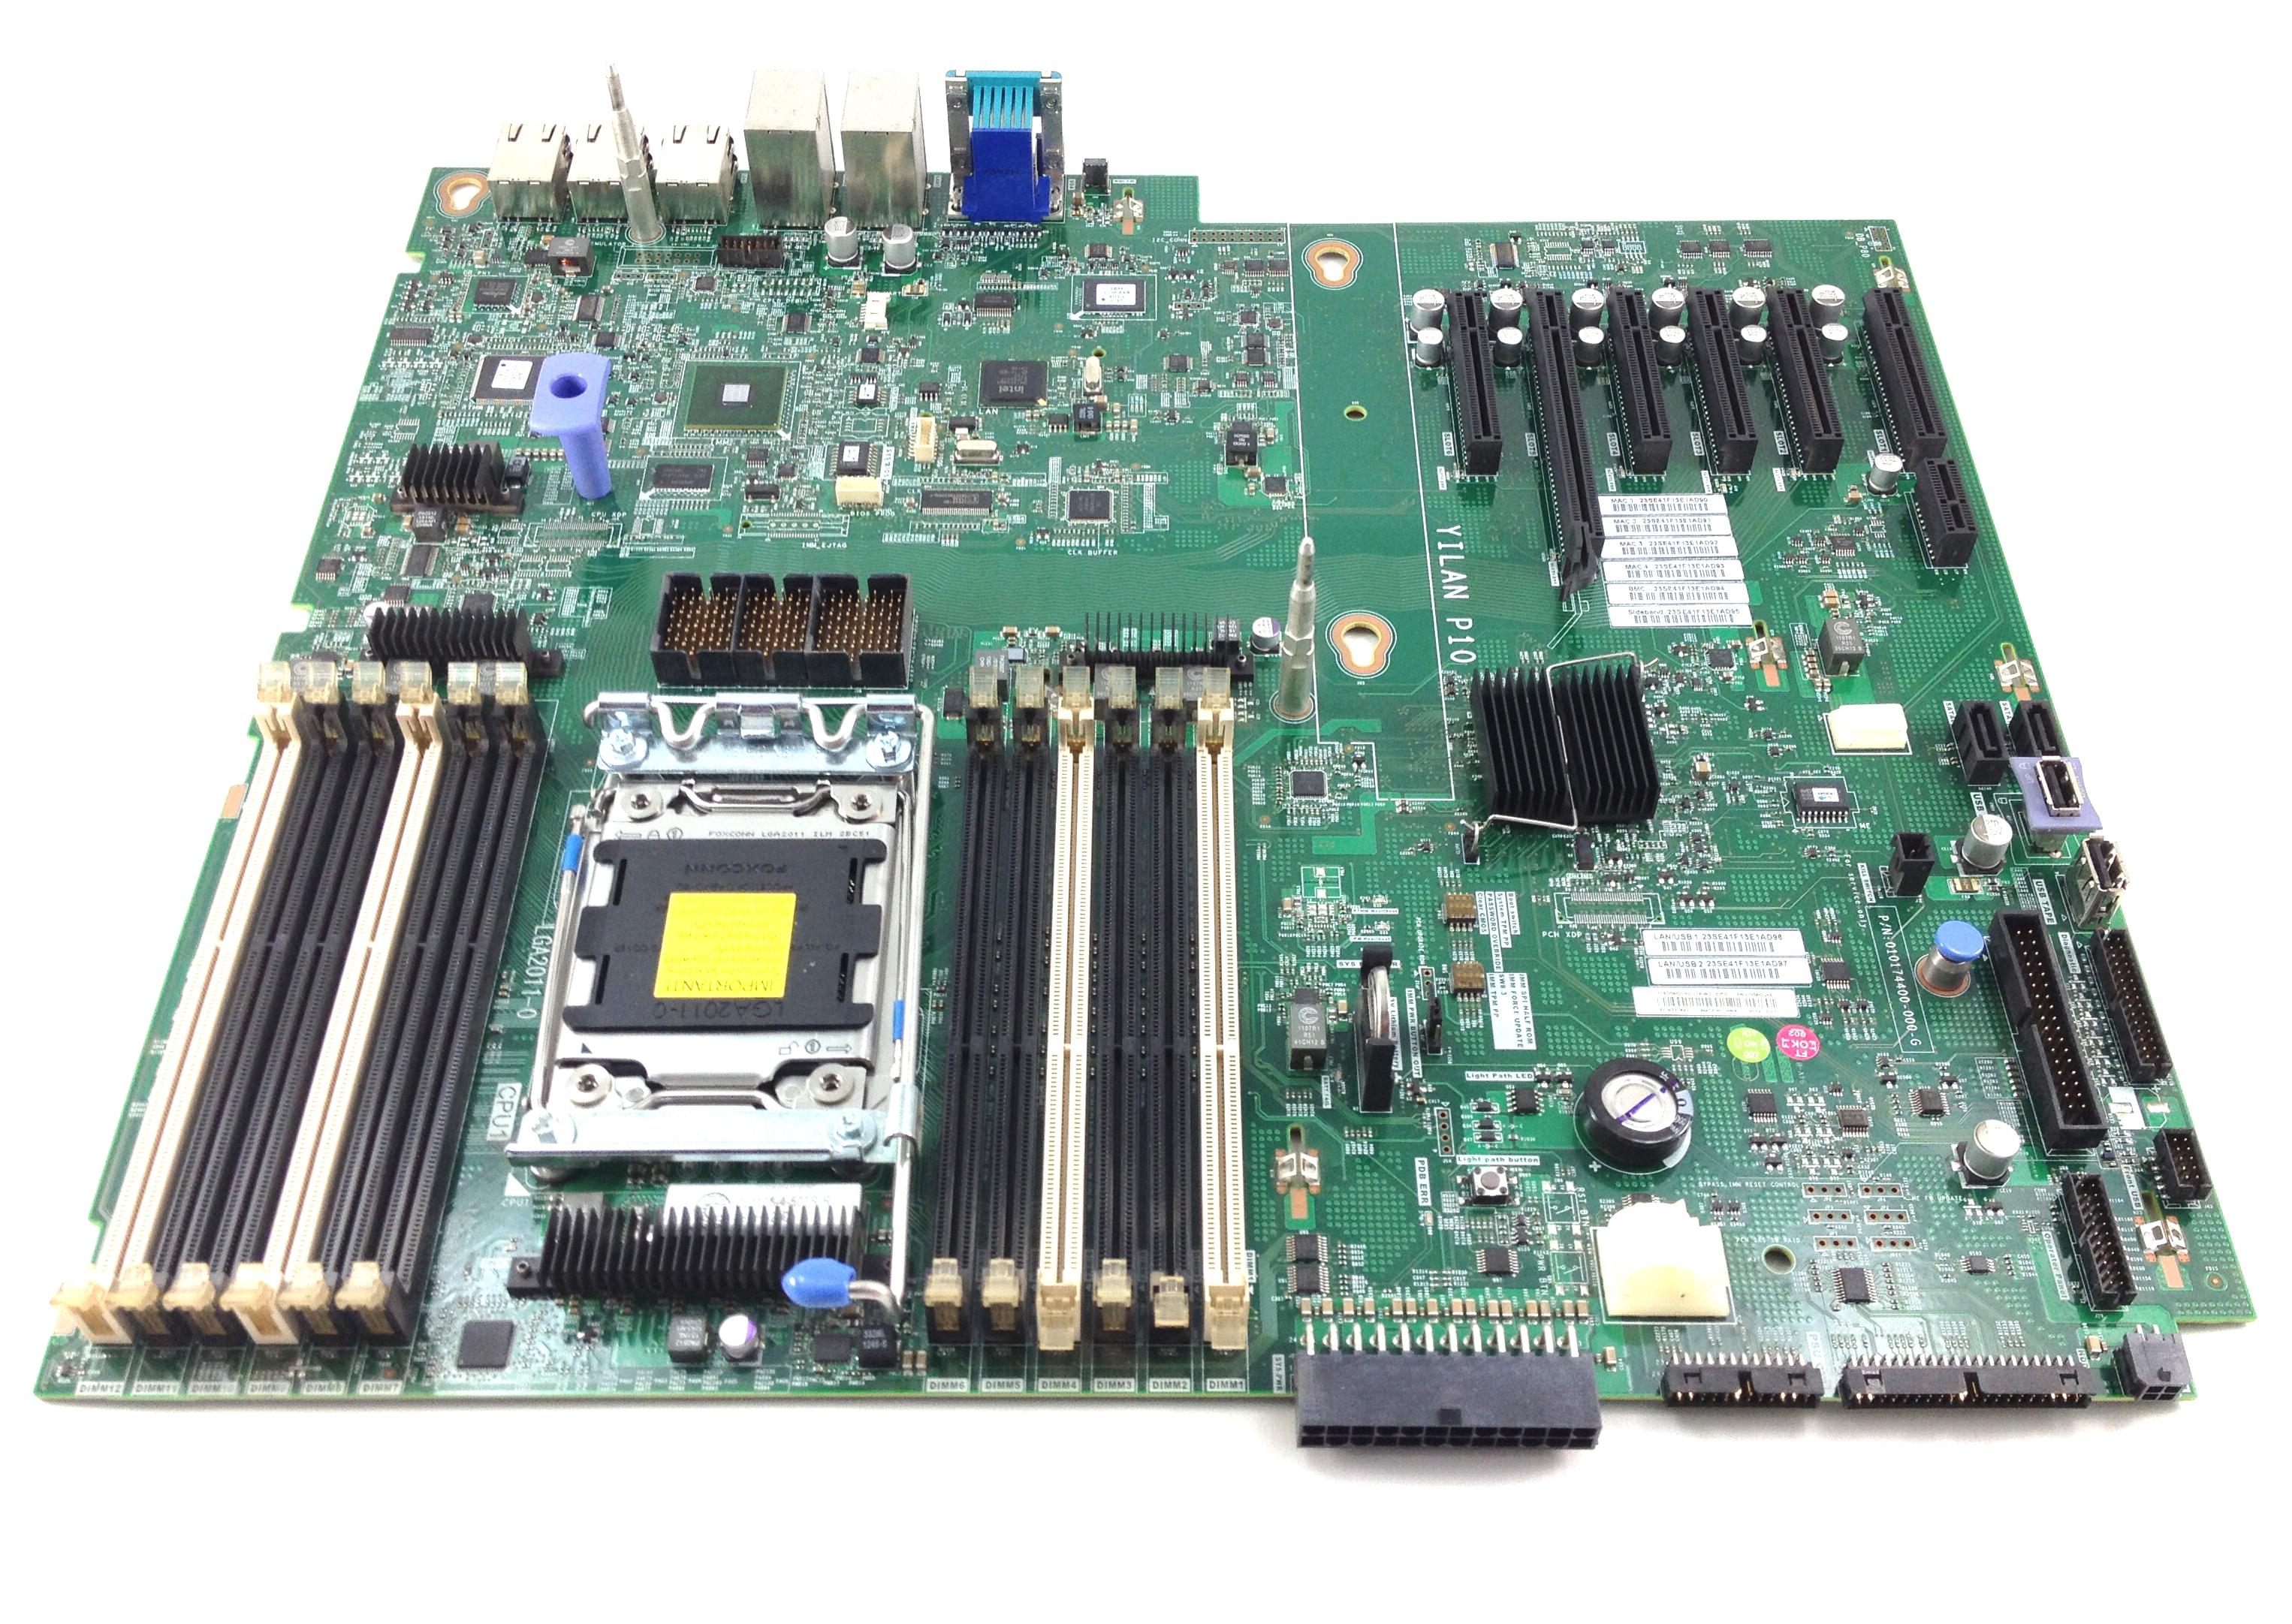 IBM System X3500 M4 Server Motherboard System Board (00W2046)